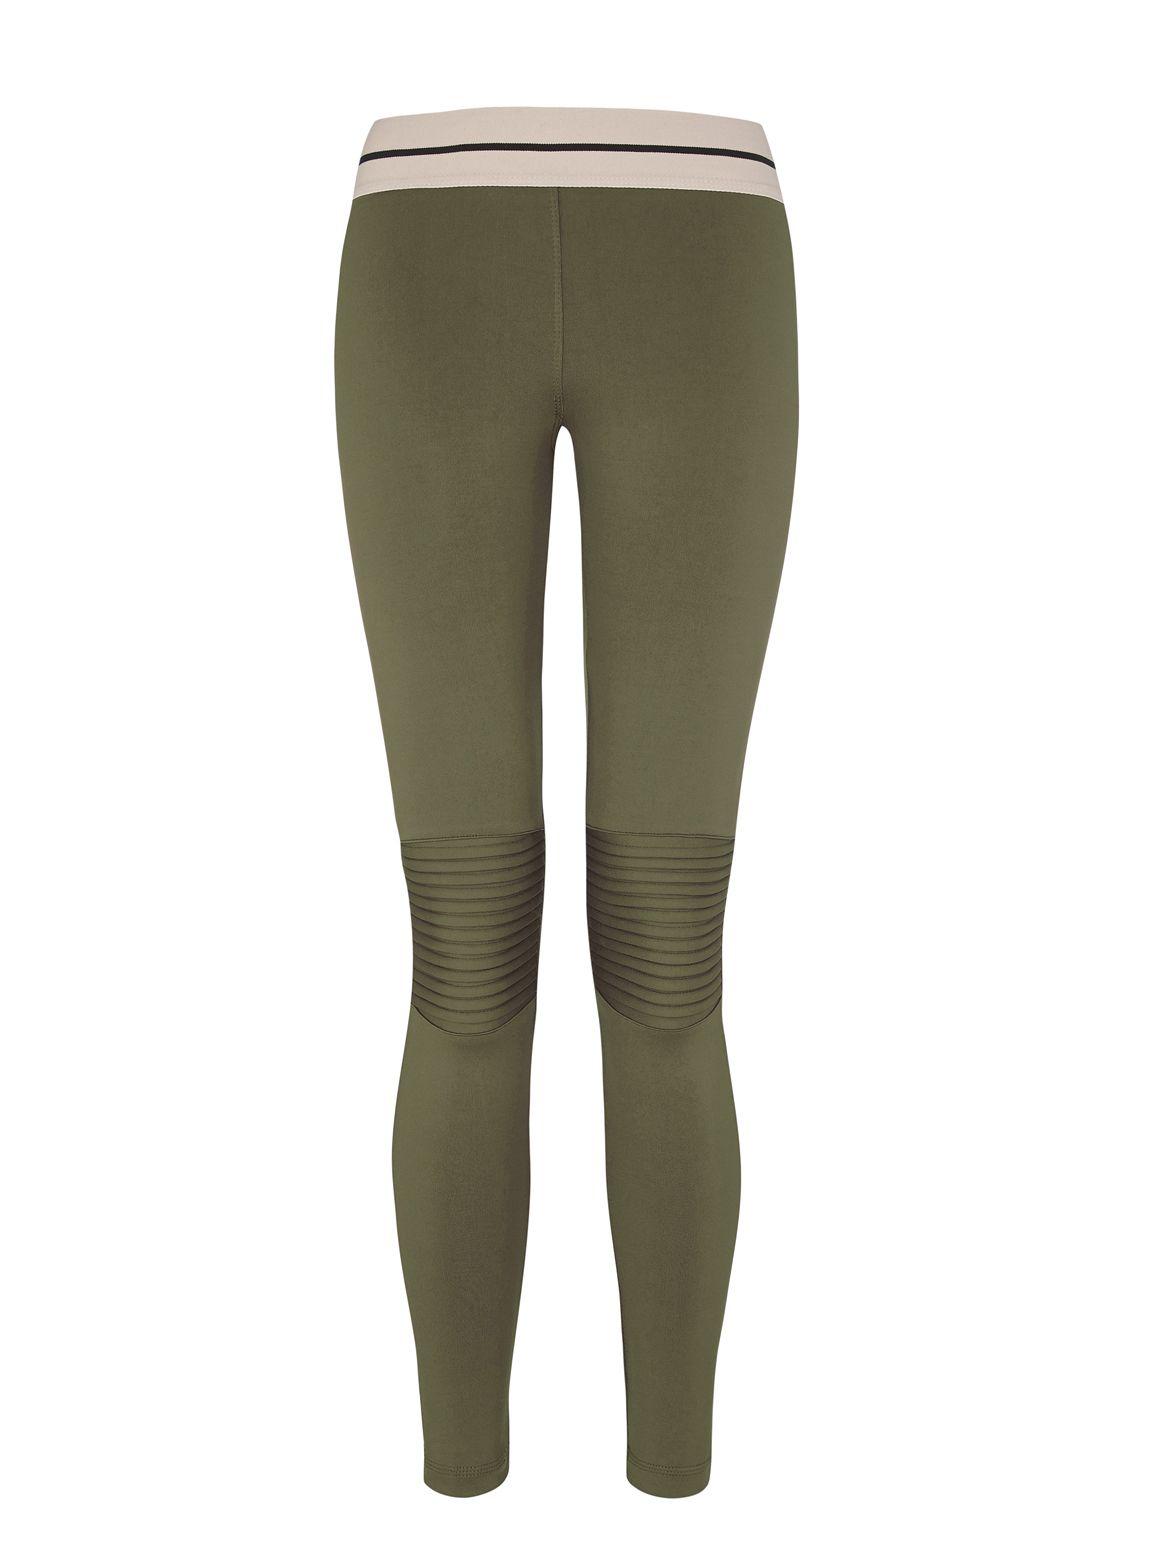 Army Moto Leggings Olympia activewear, Active wear, Leggings